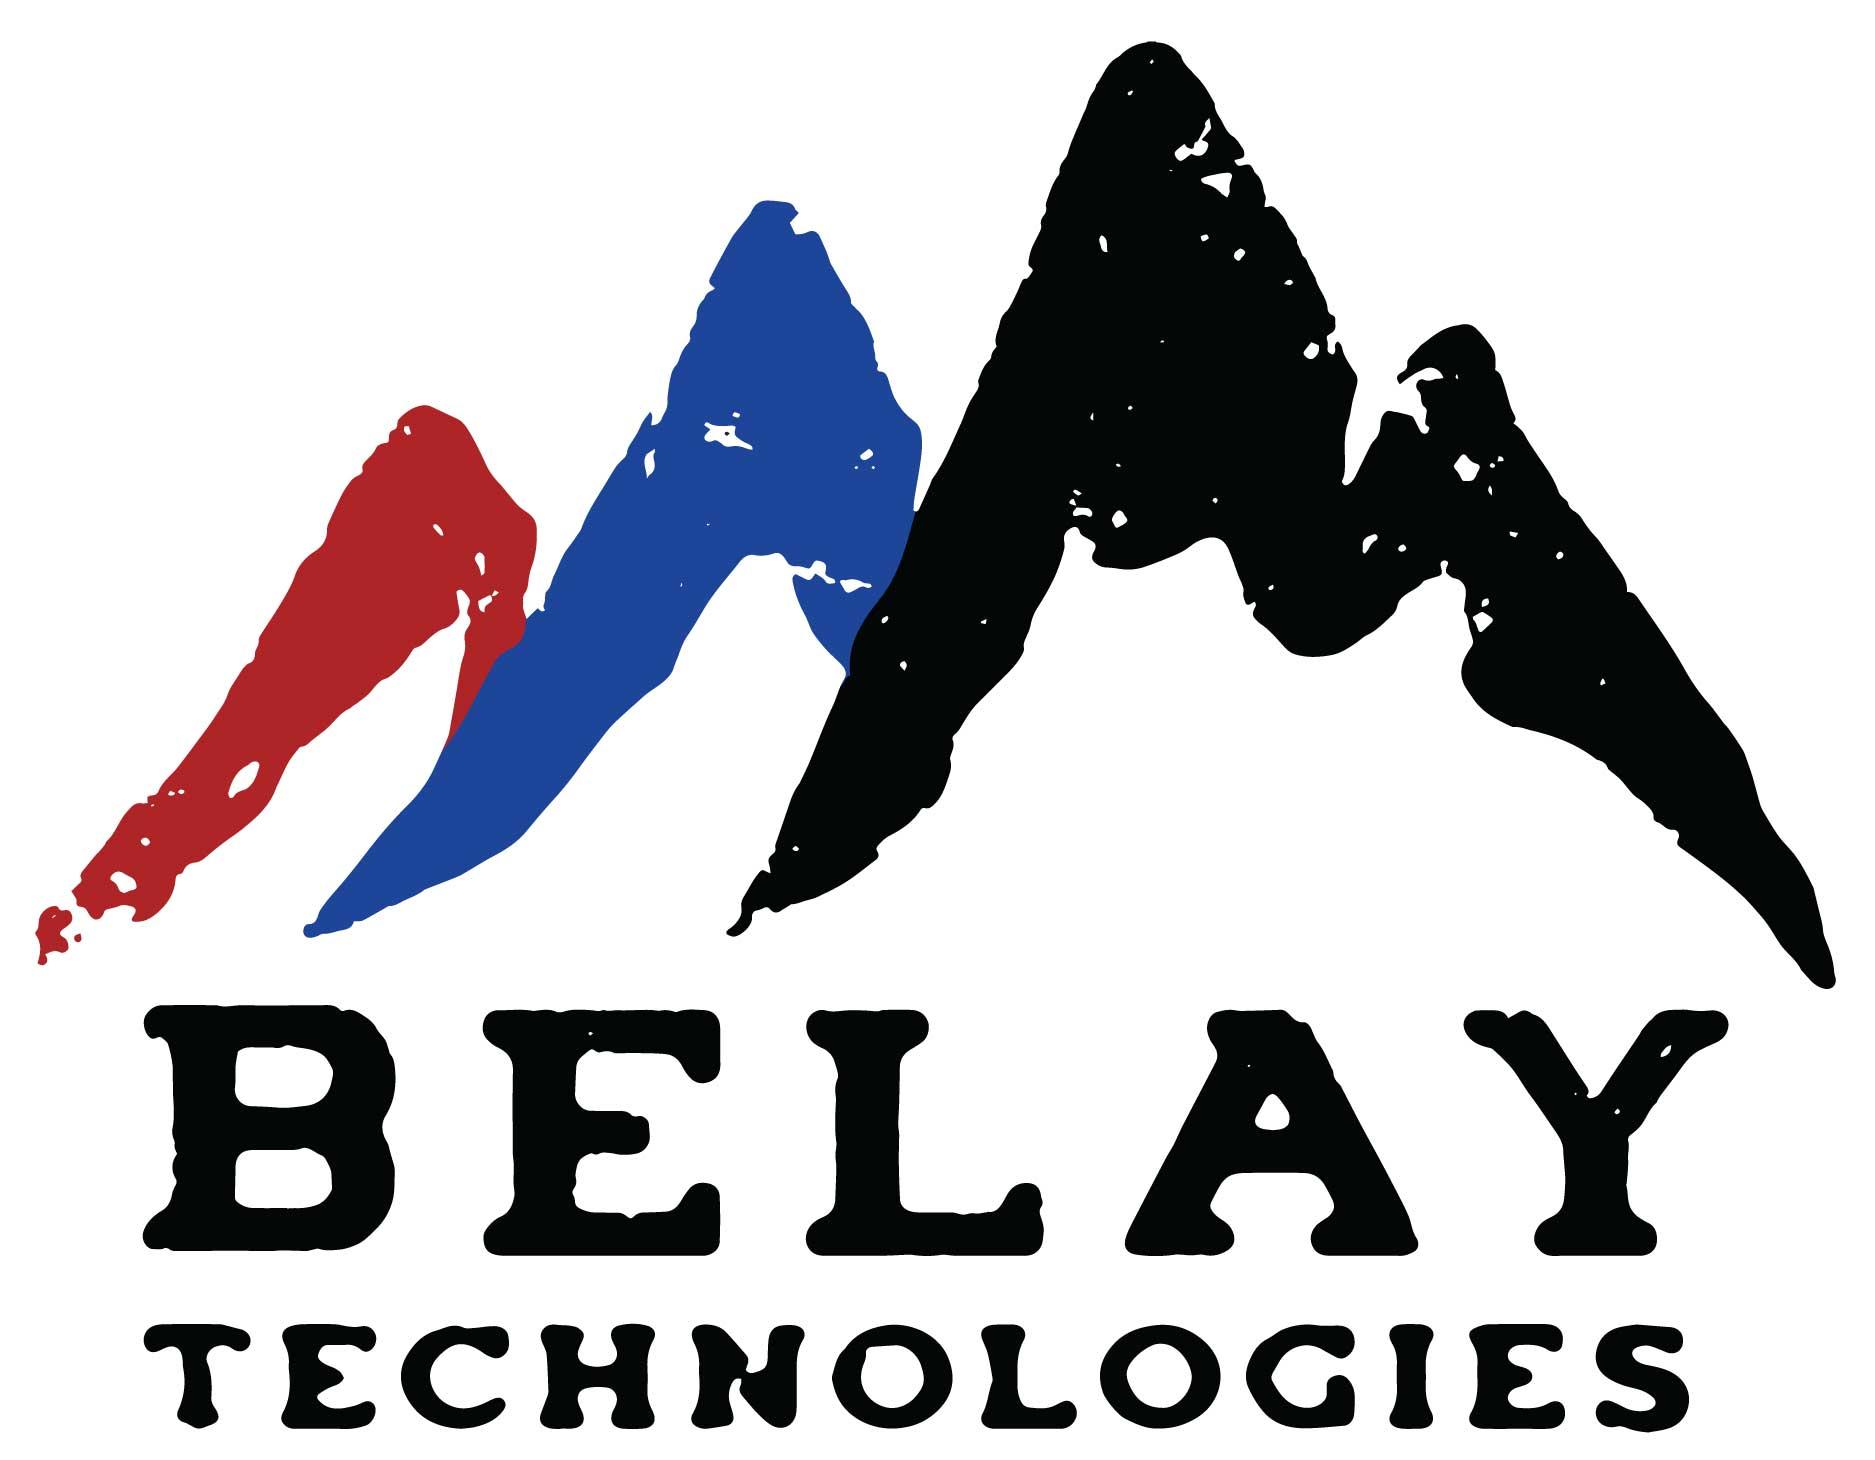 Belay Technology